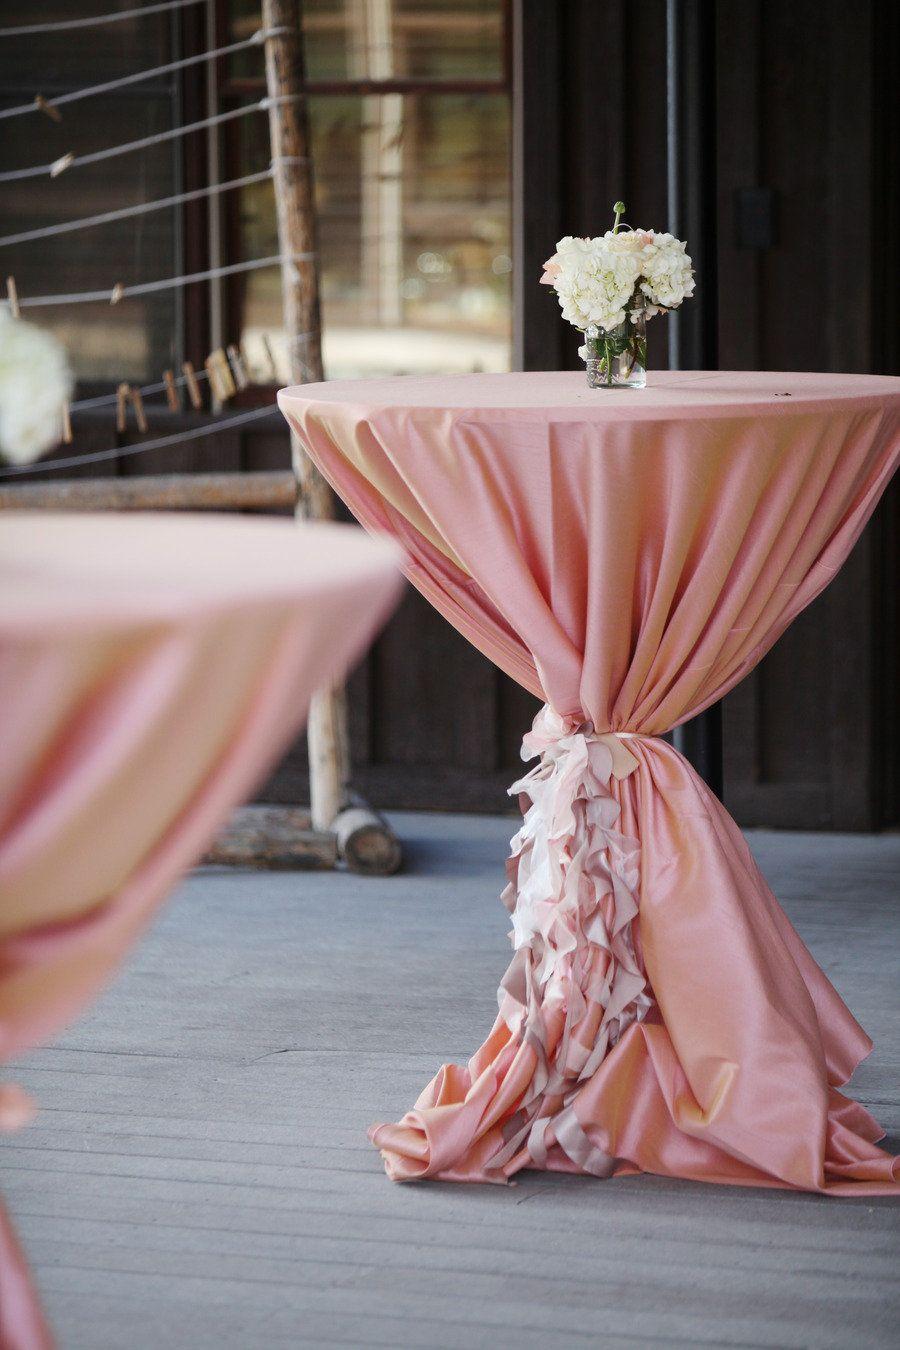 Wedding cocktail hour decor table design linens for Wedding cocktail tables decorations